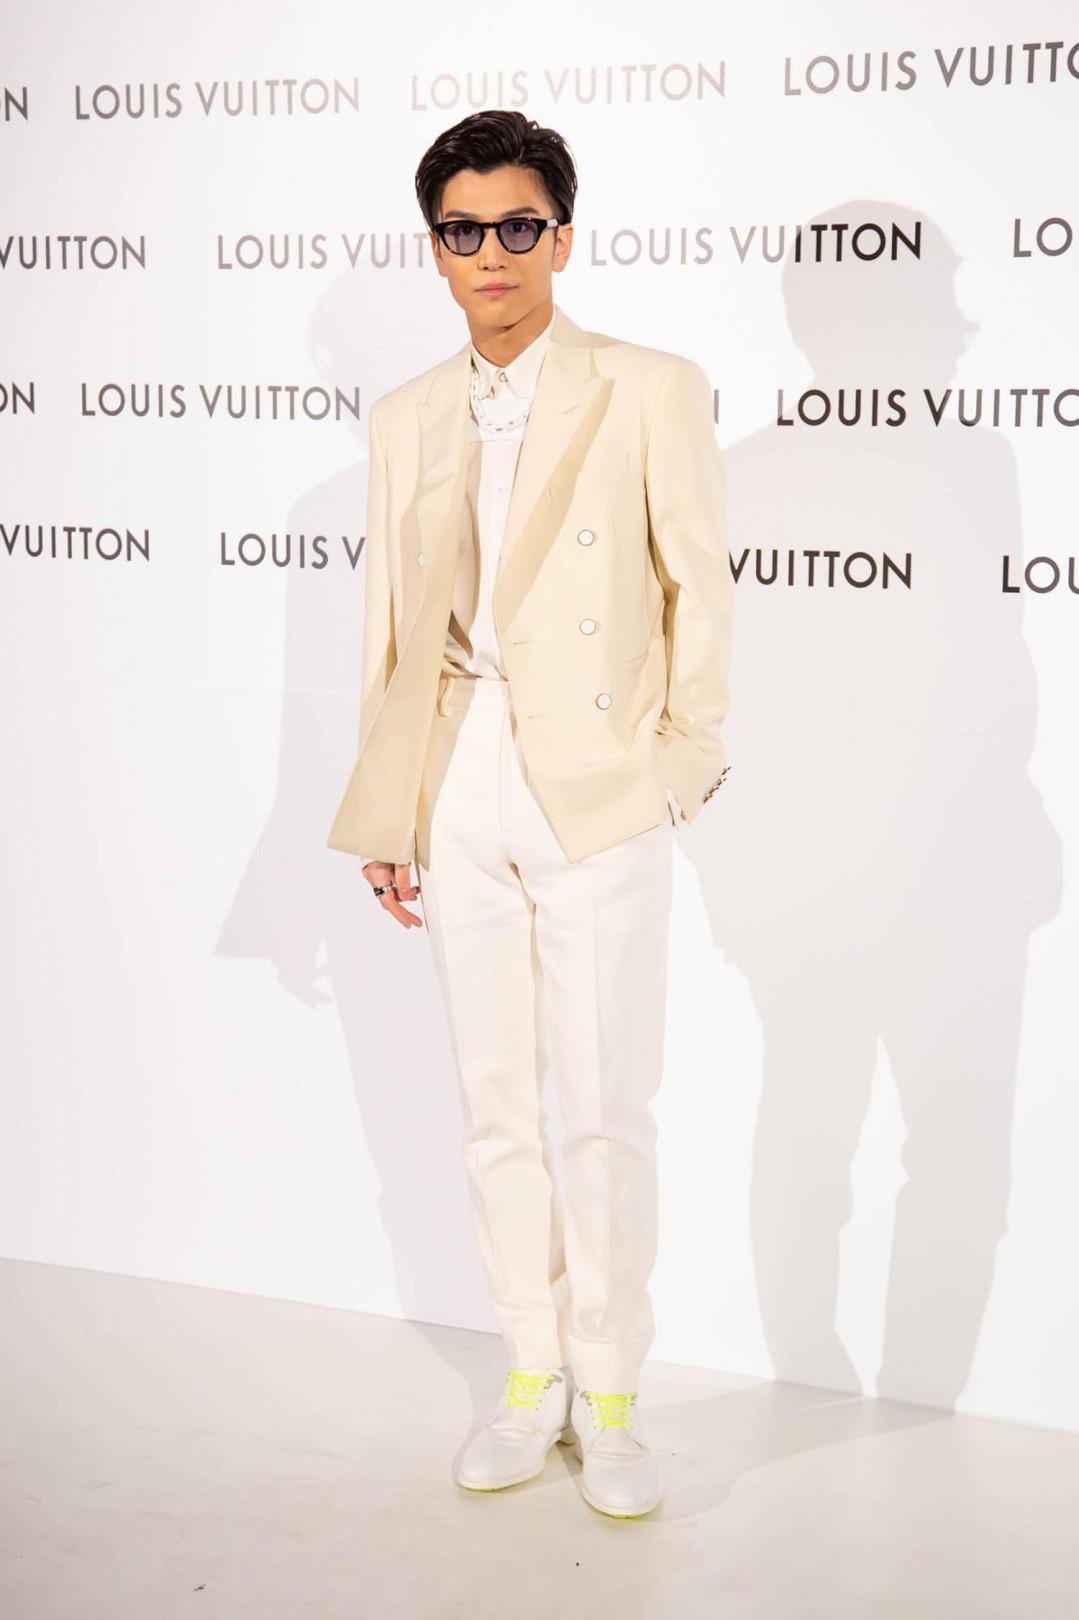 「Louis Vuitton Men's SS19 Pop-Up Store」